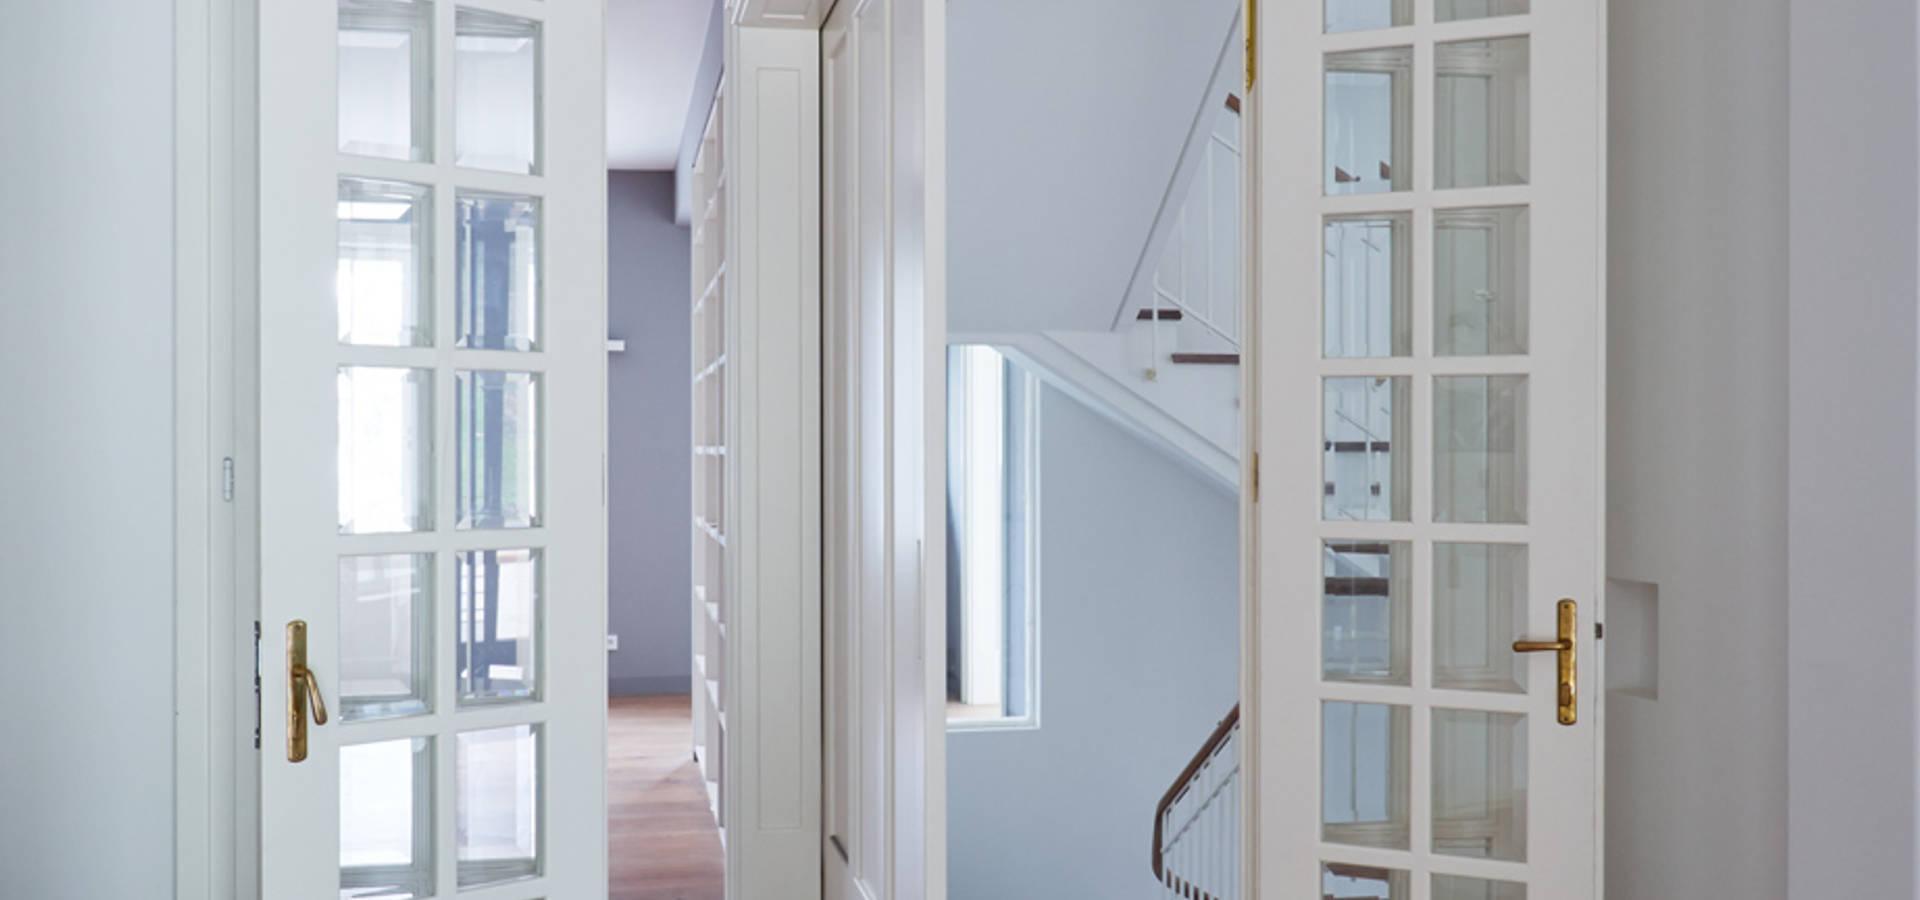 Stil-Villa in Döbling by Mayr & Glatzl Innenarchitektur Gmbh | homify